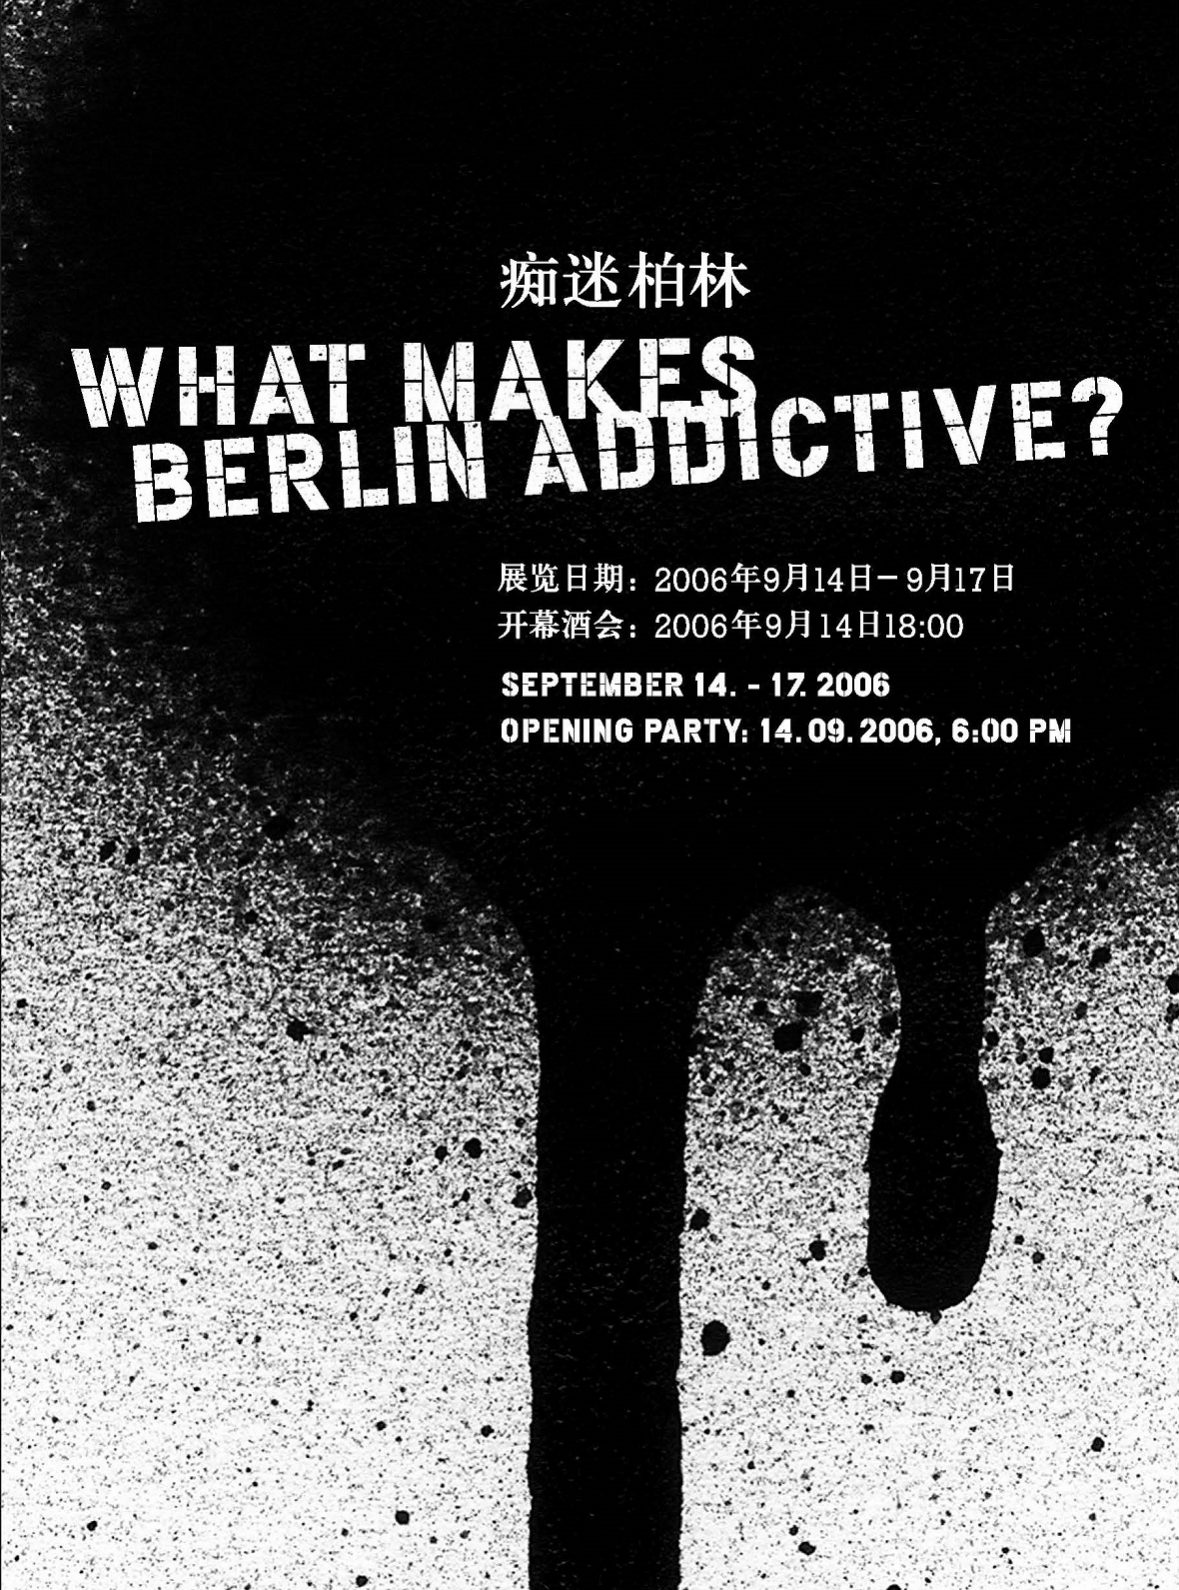 What makes Berlin addictive?